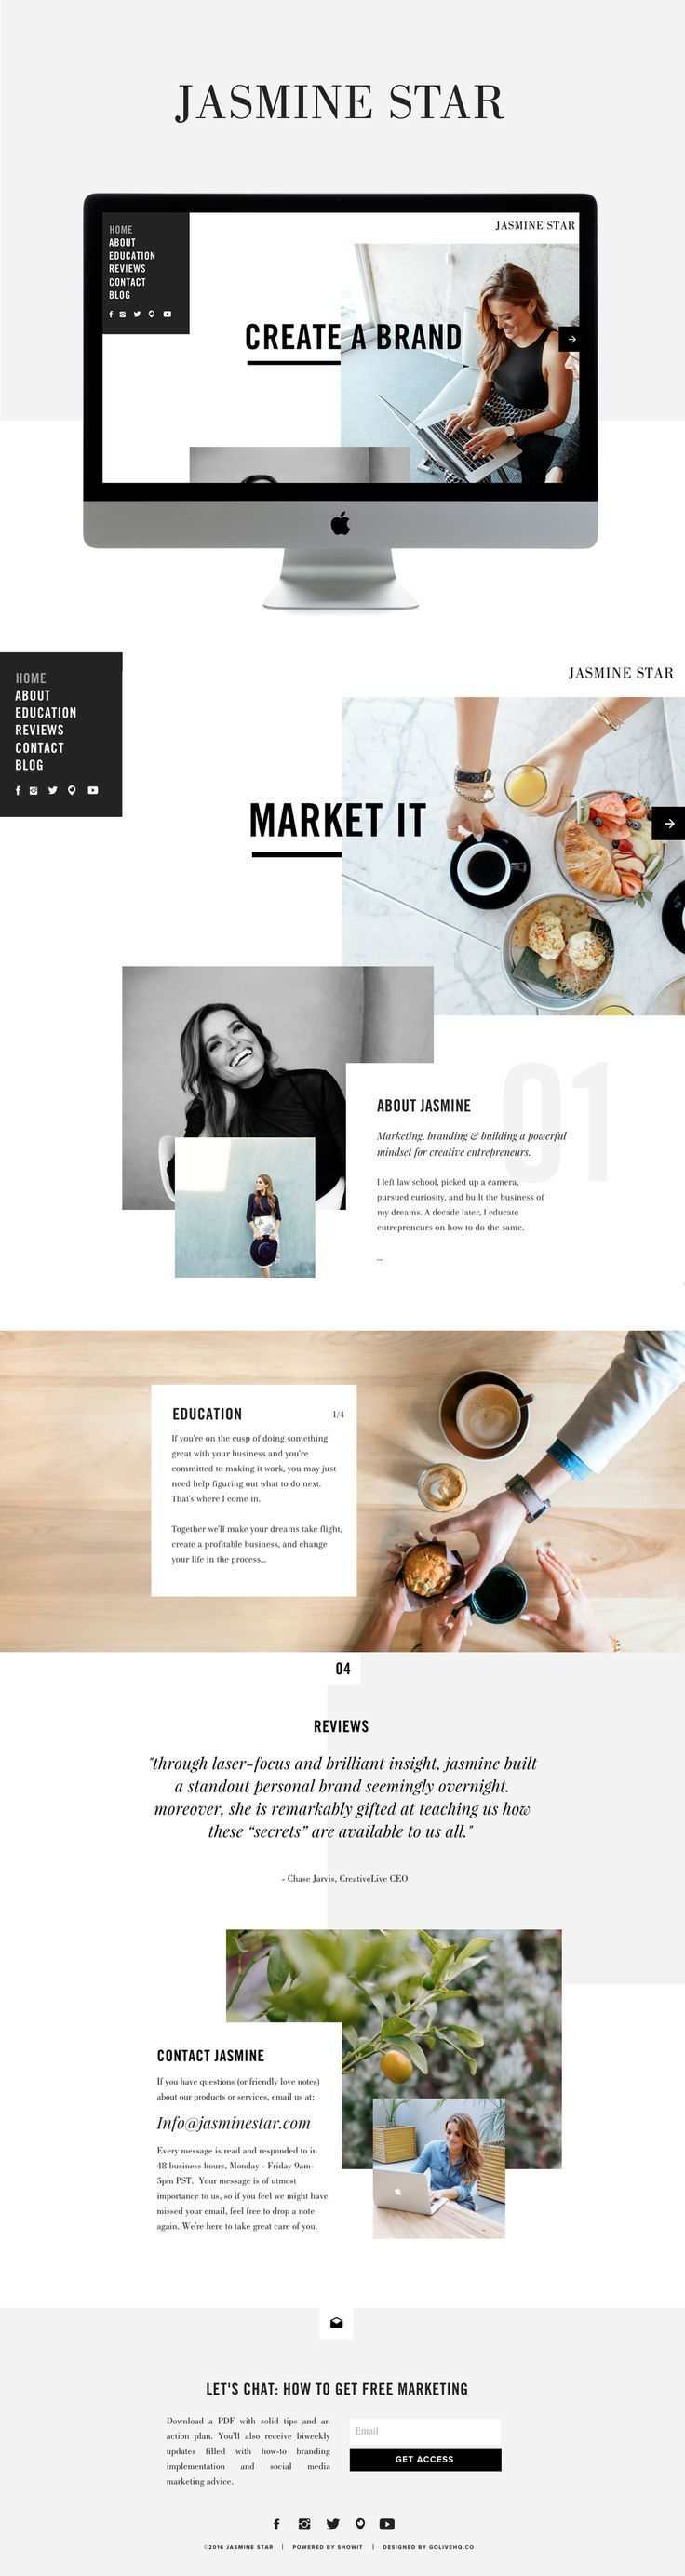 jasmine star website - inspiration  |  by http://golivehq.co